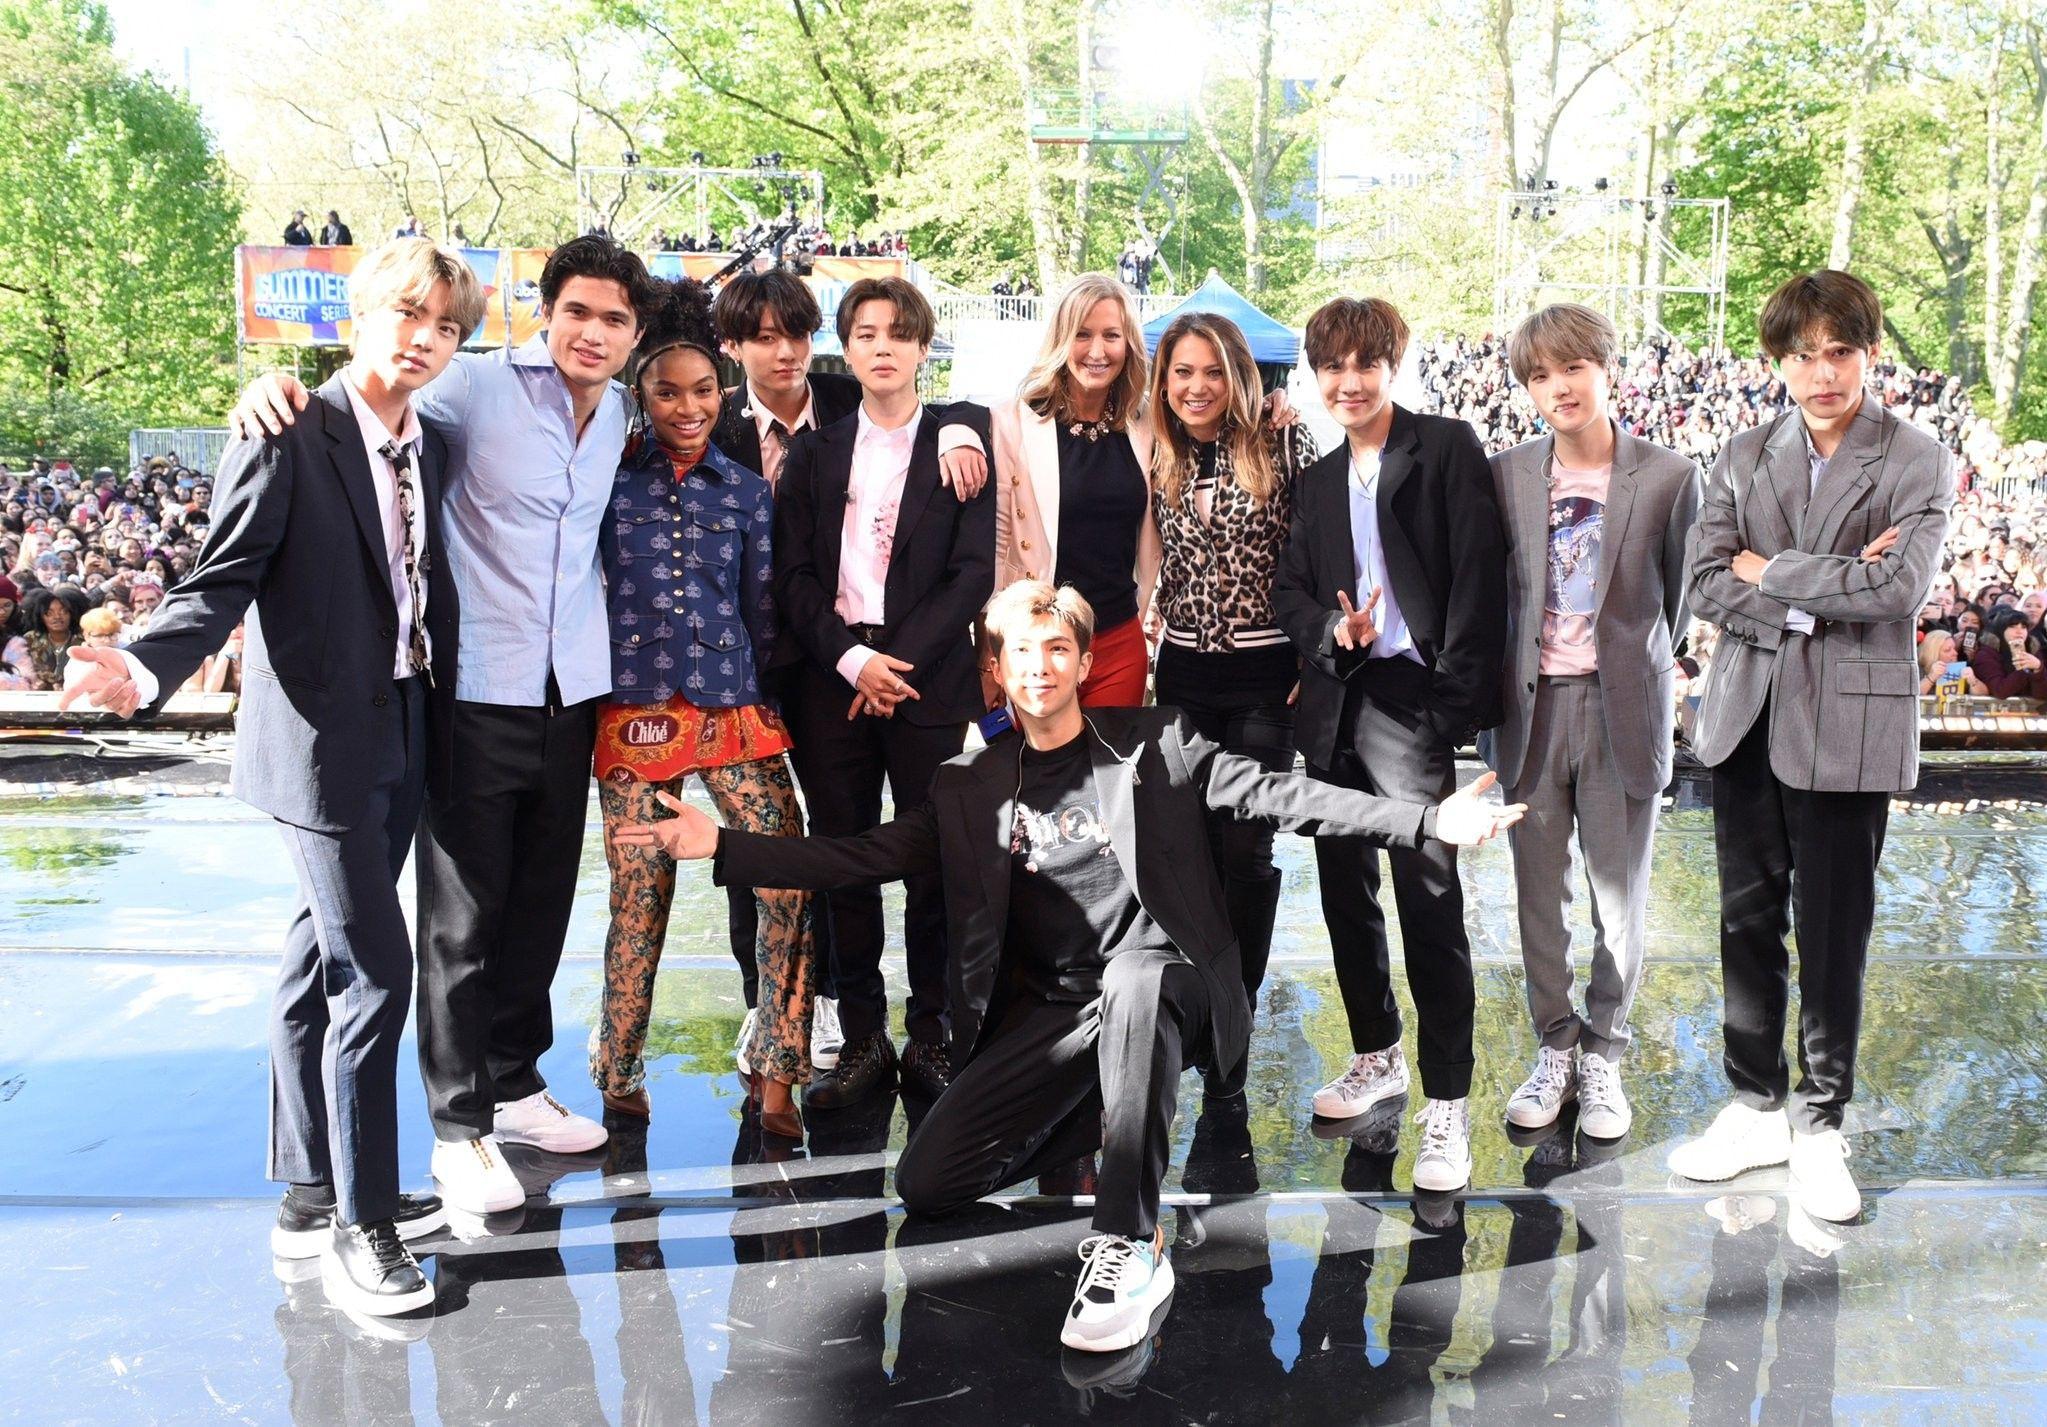 J-Hope Homage Hoody Hoodie Top Fashion Fangirl BTS Kpop Jimin Suga Band Hope